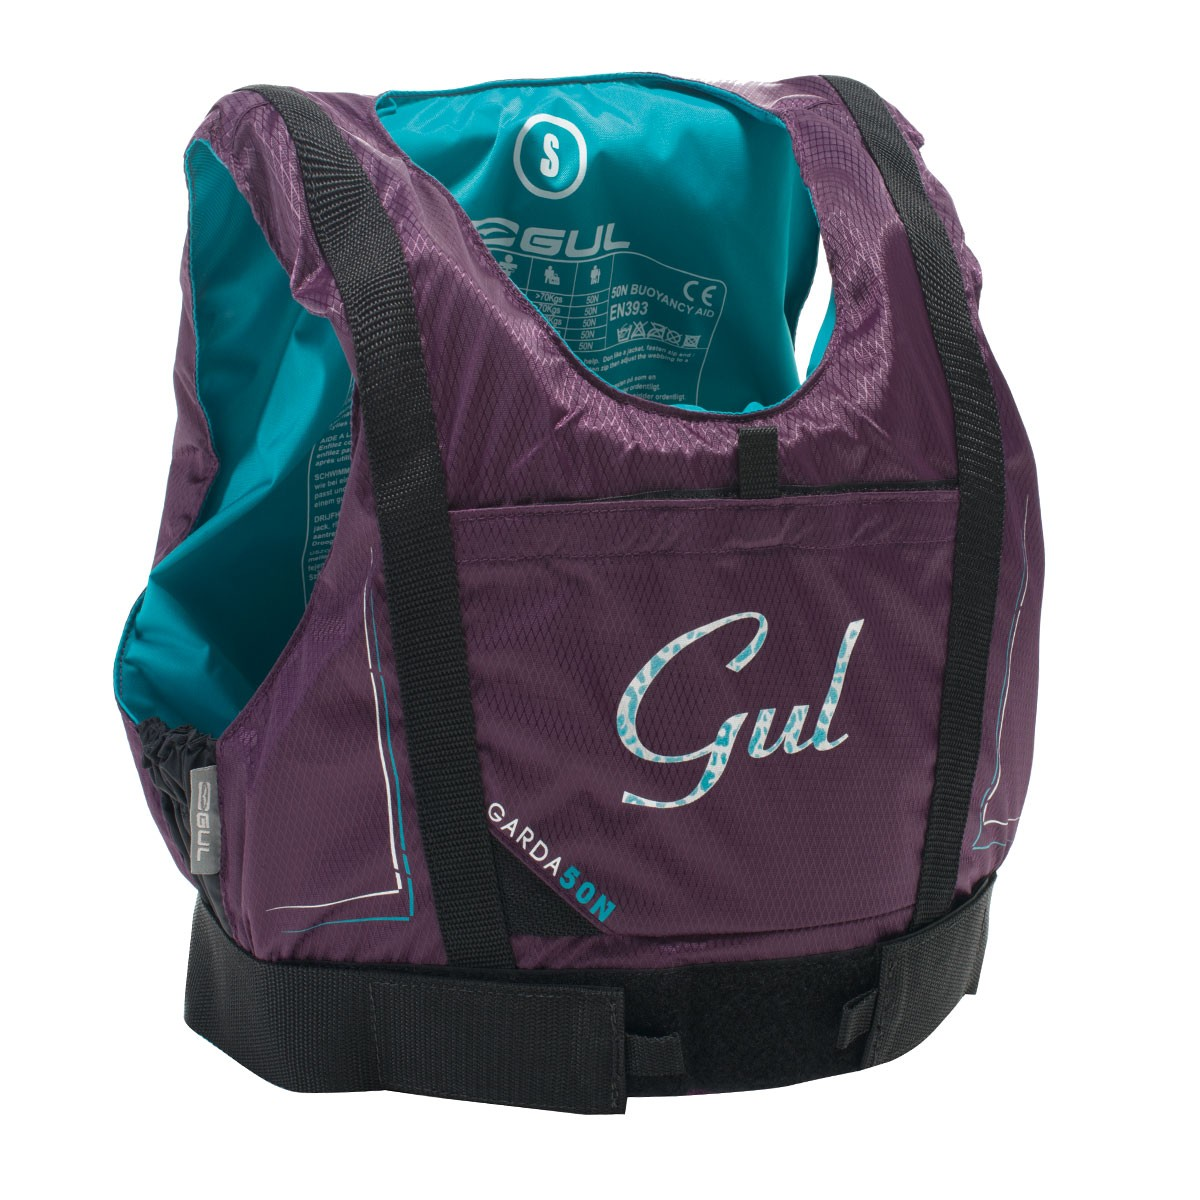 dámská záchranná vesta GUL Garda 50N GM0162 fialová M